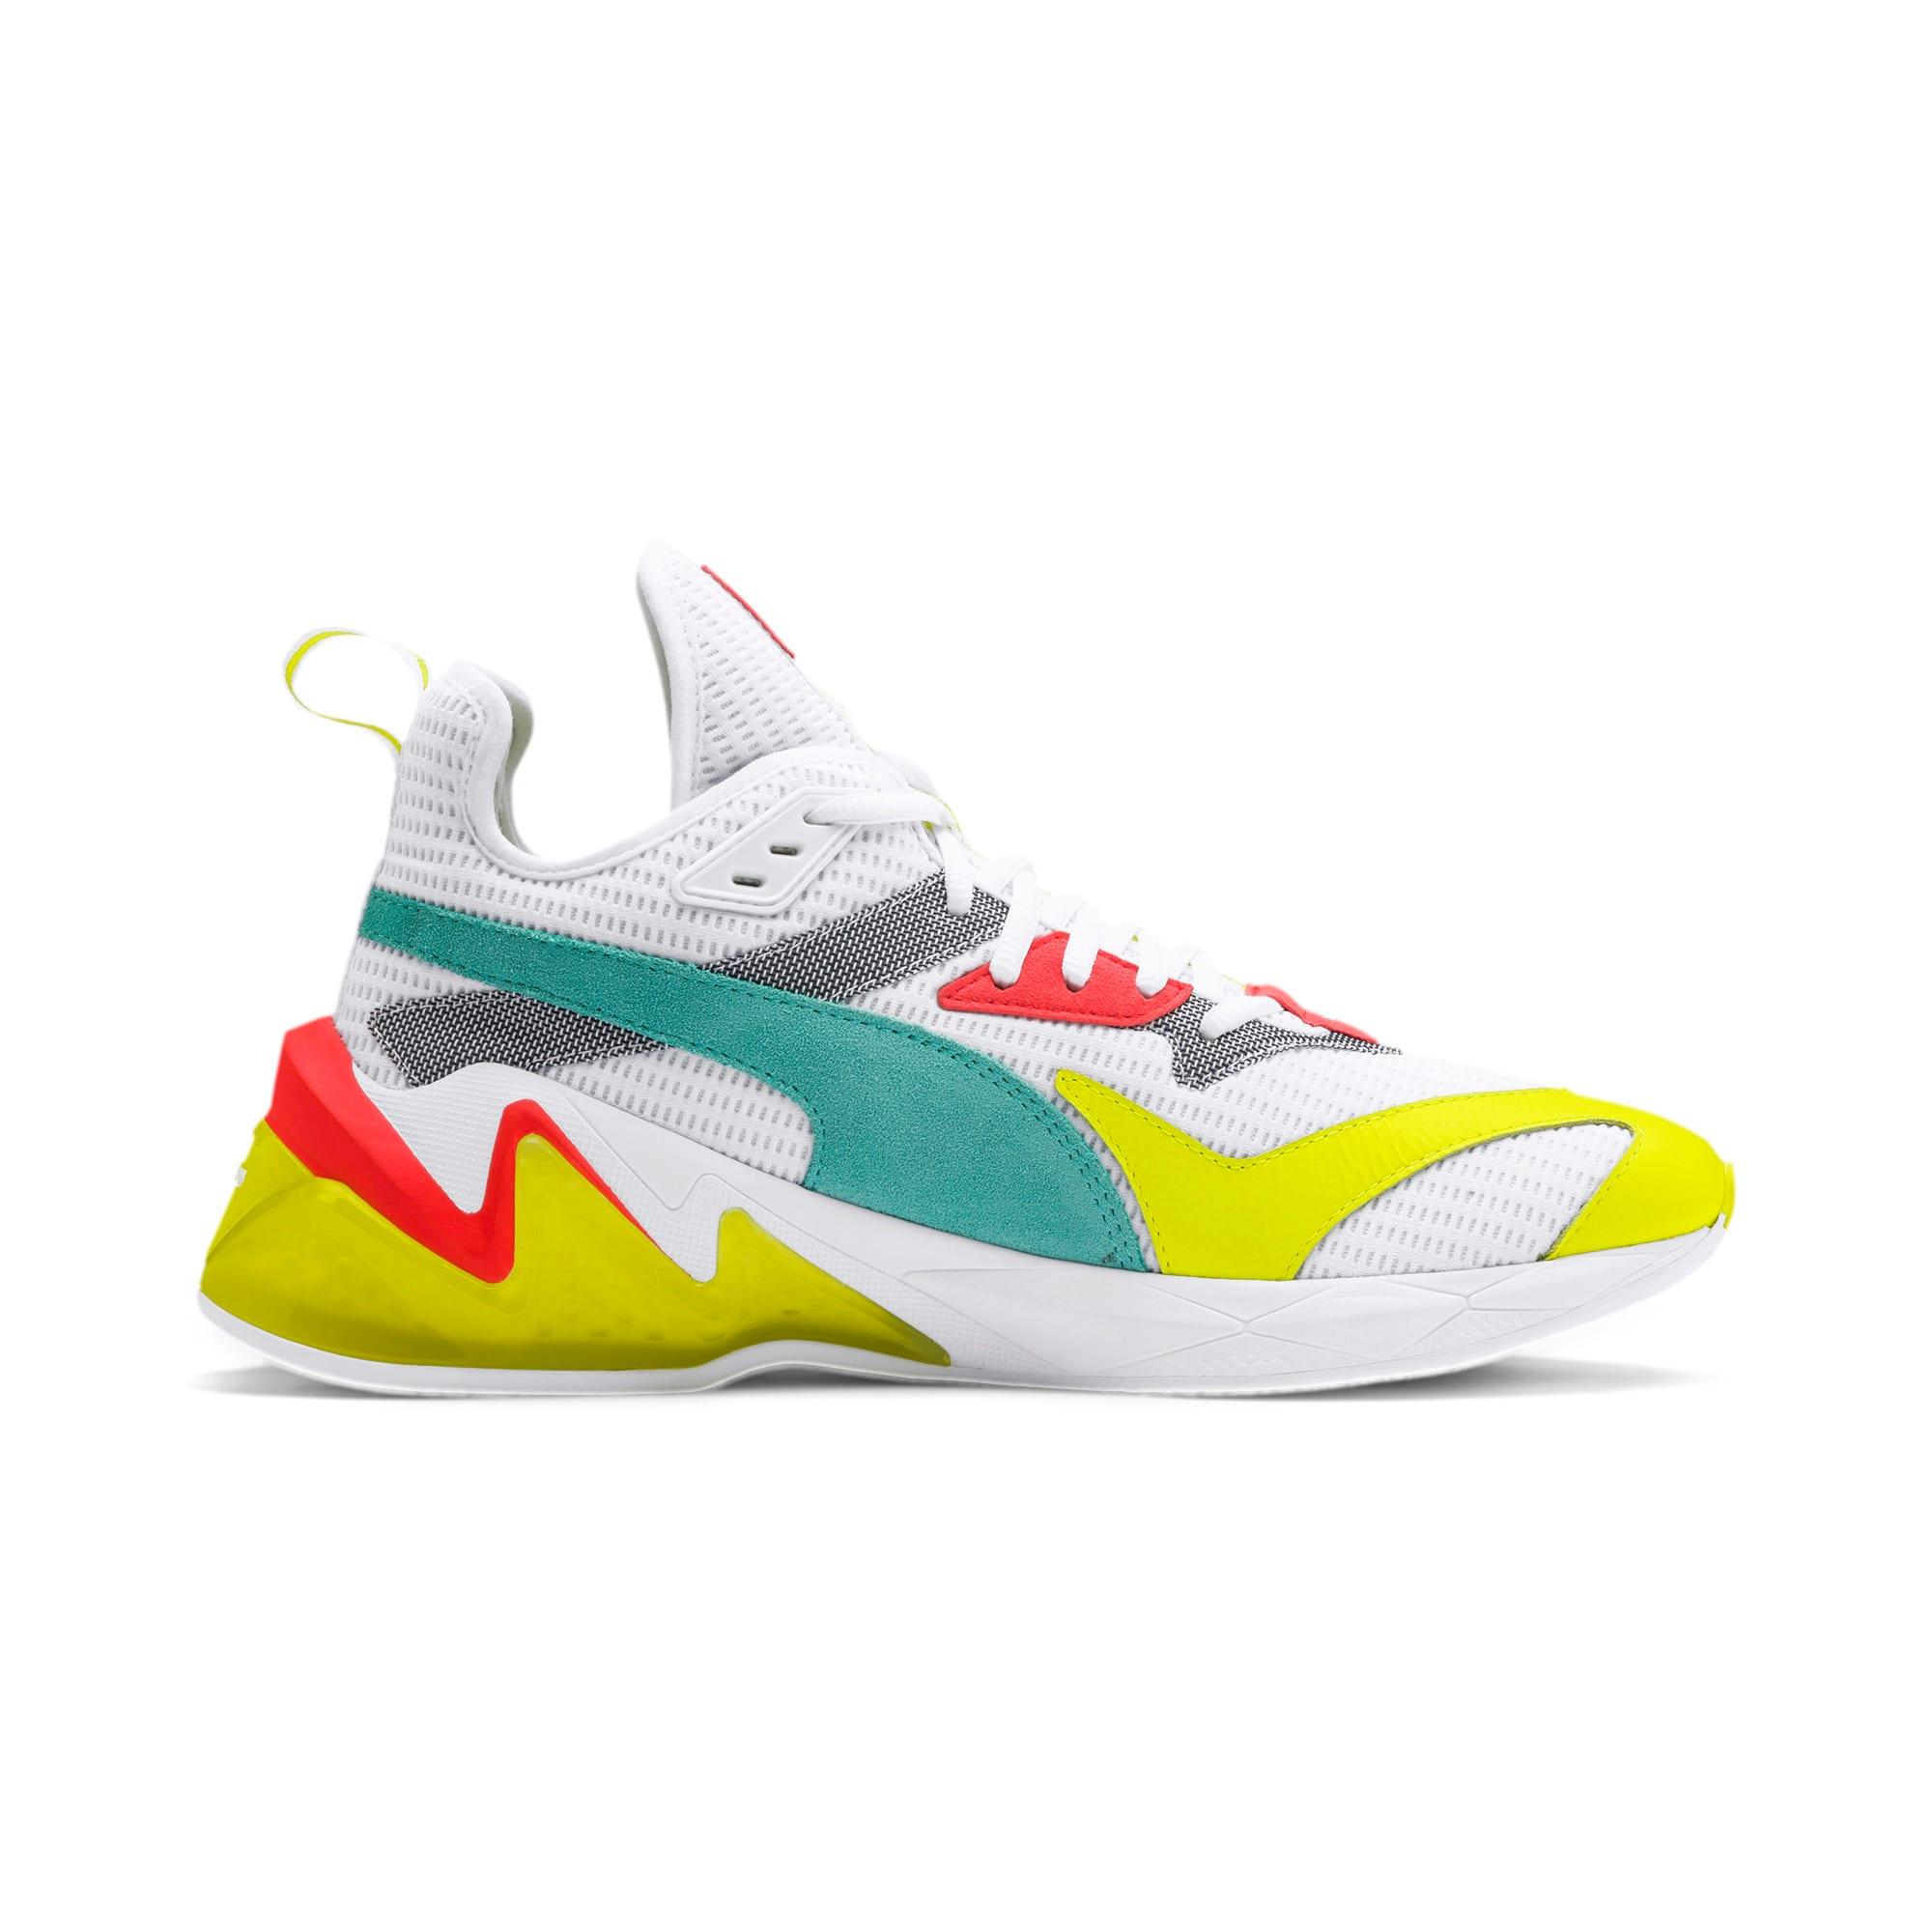 Thumbnail 6 of LQDCELL Origin Men's Shoes, Puma White-Yellow Alert, medium